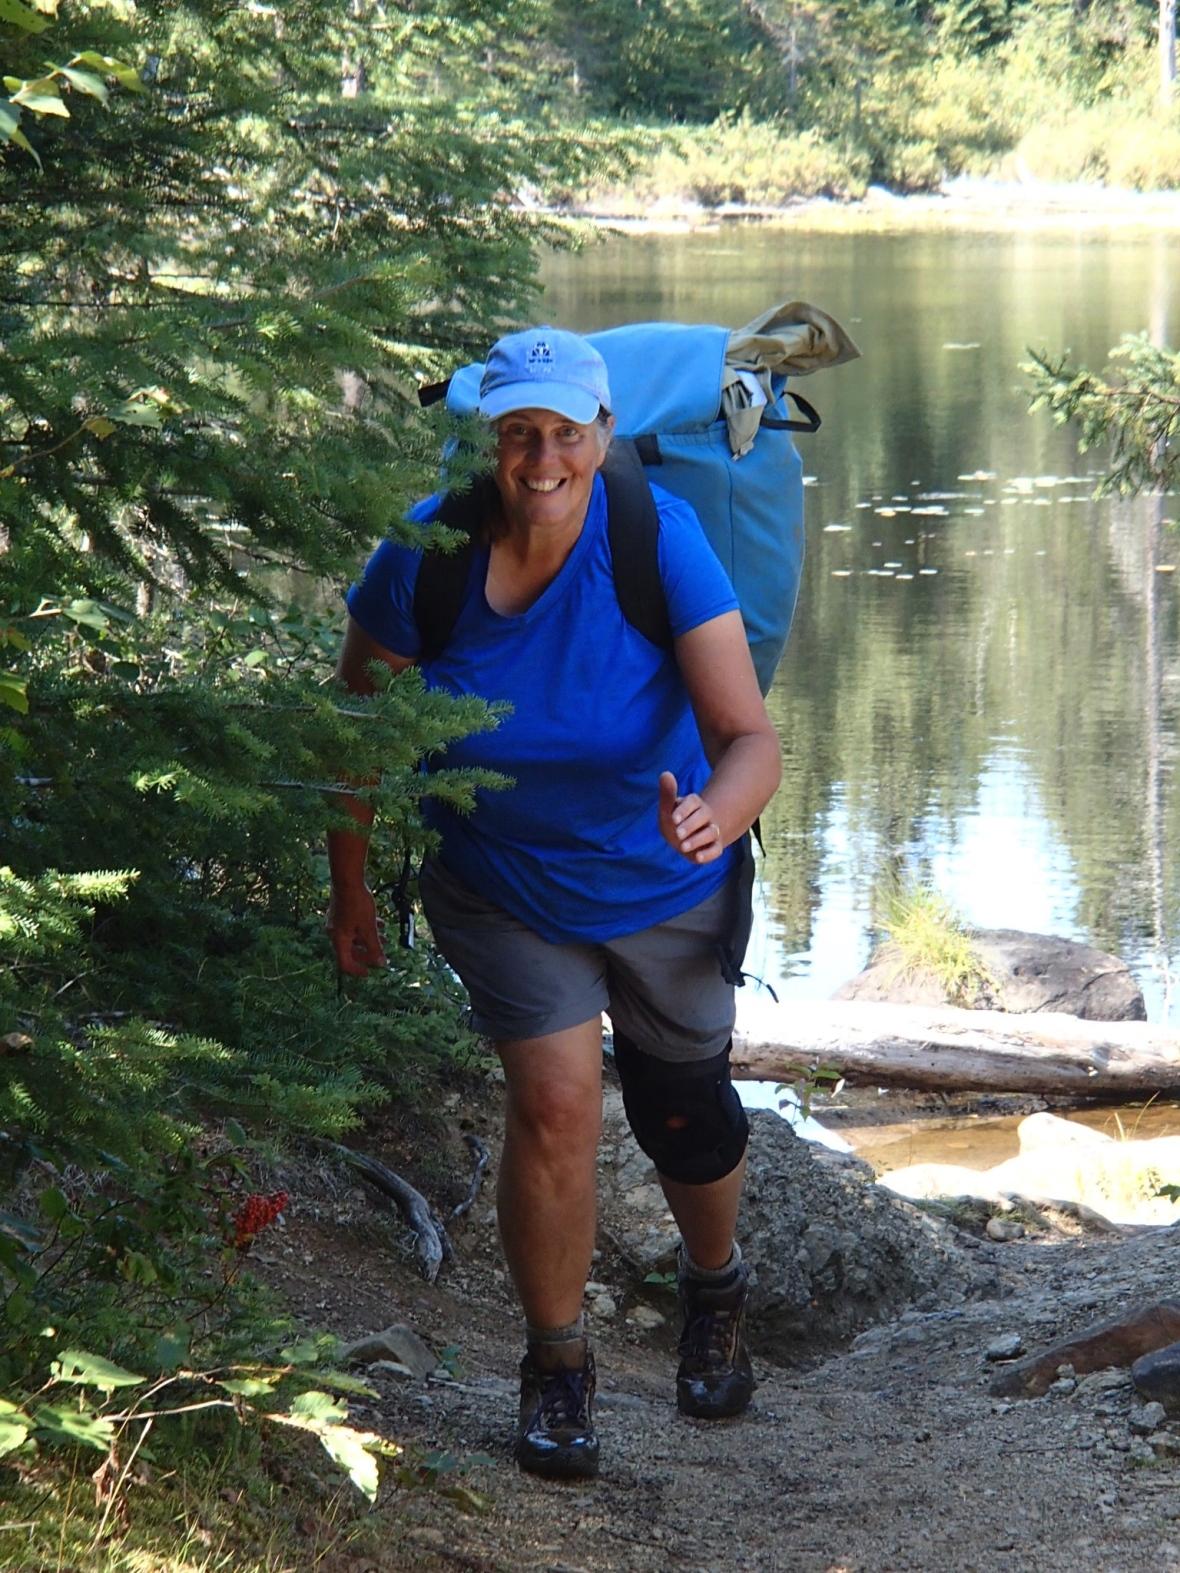 BWCA trip, Kawishiwi Lake to Fishdance and back, annmariemershon.com